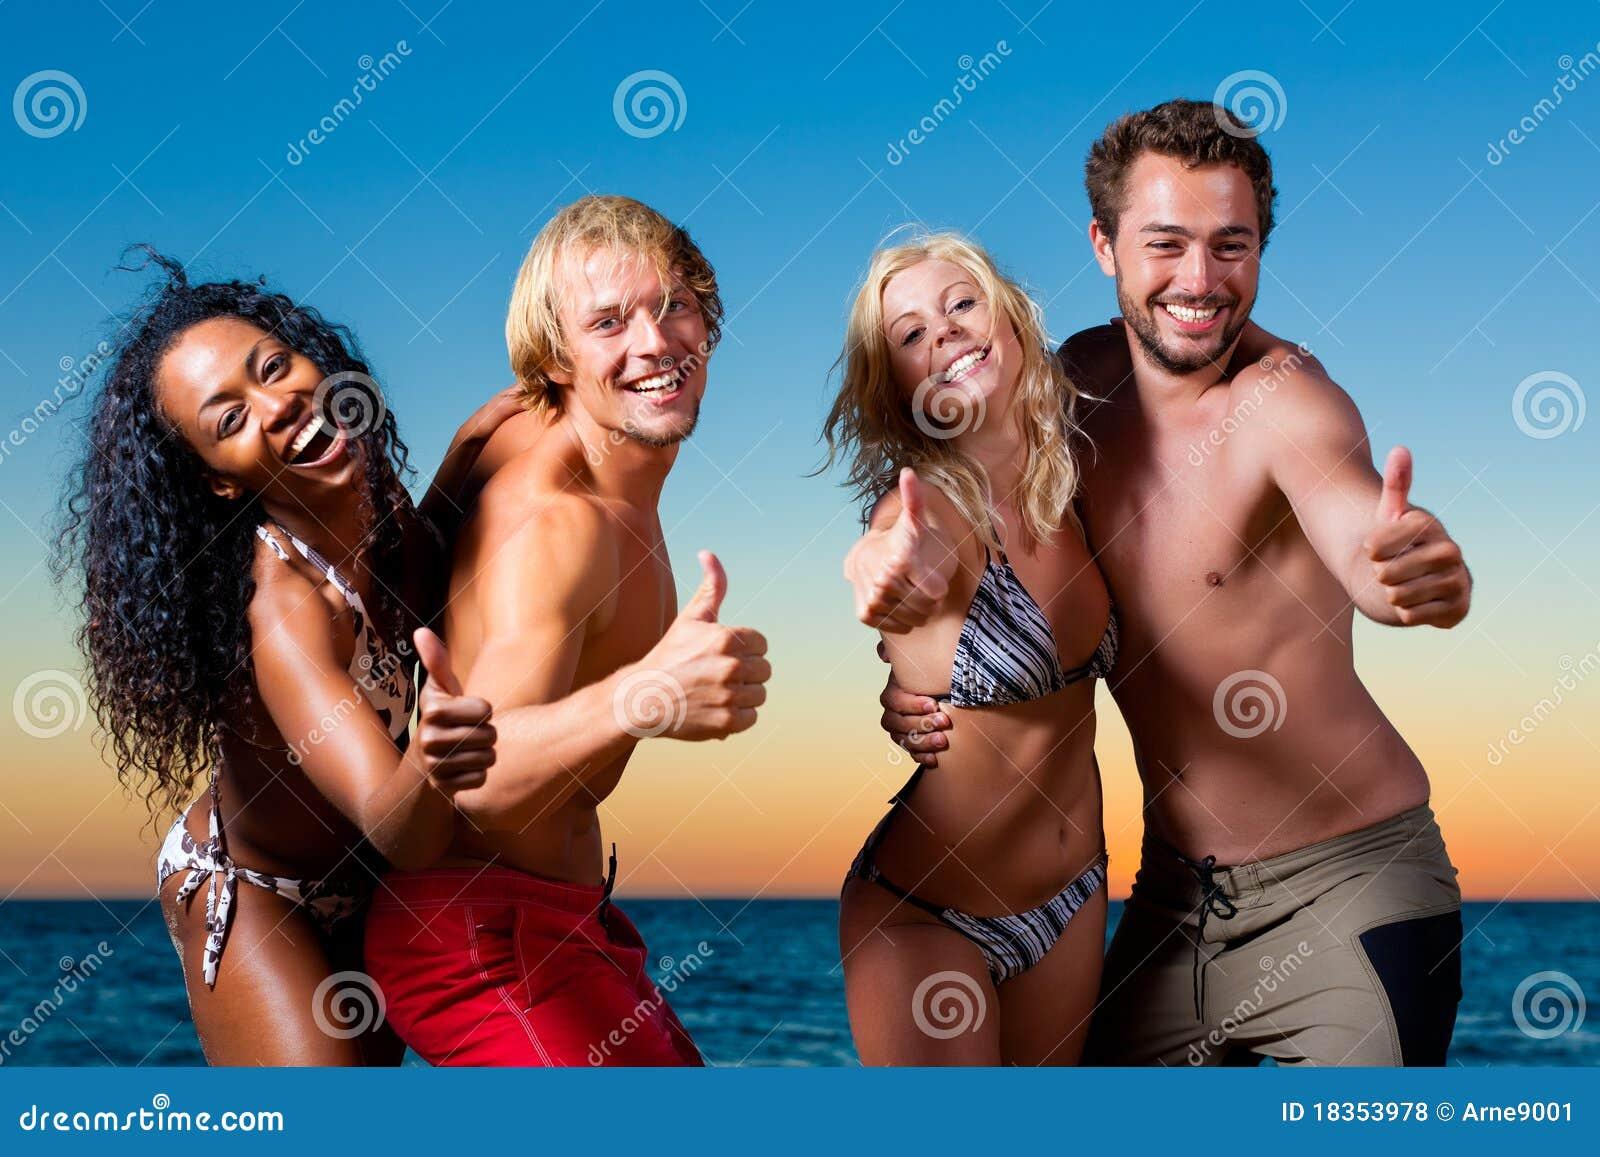 Die Party Am Strand